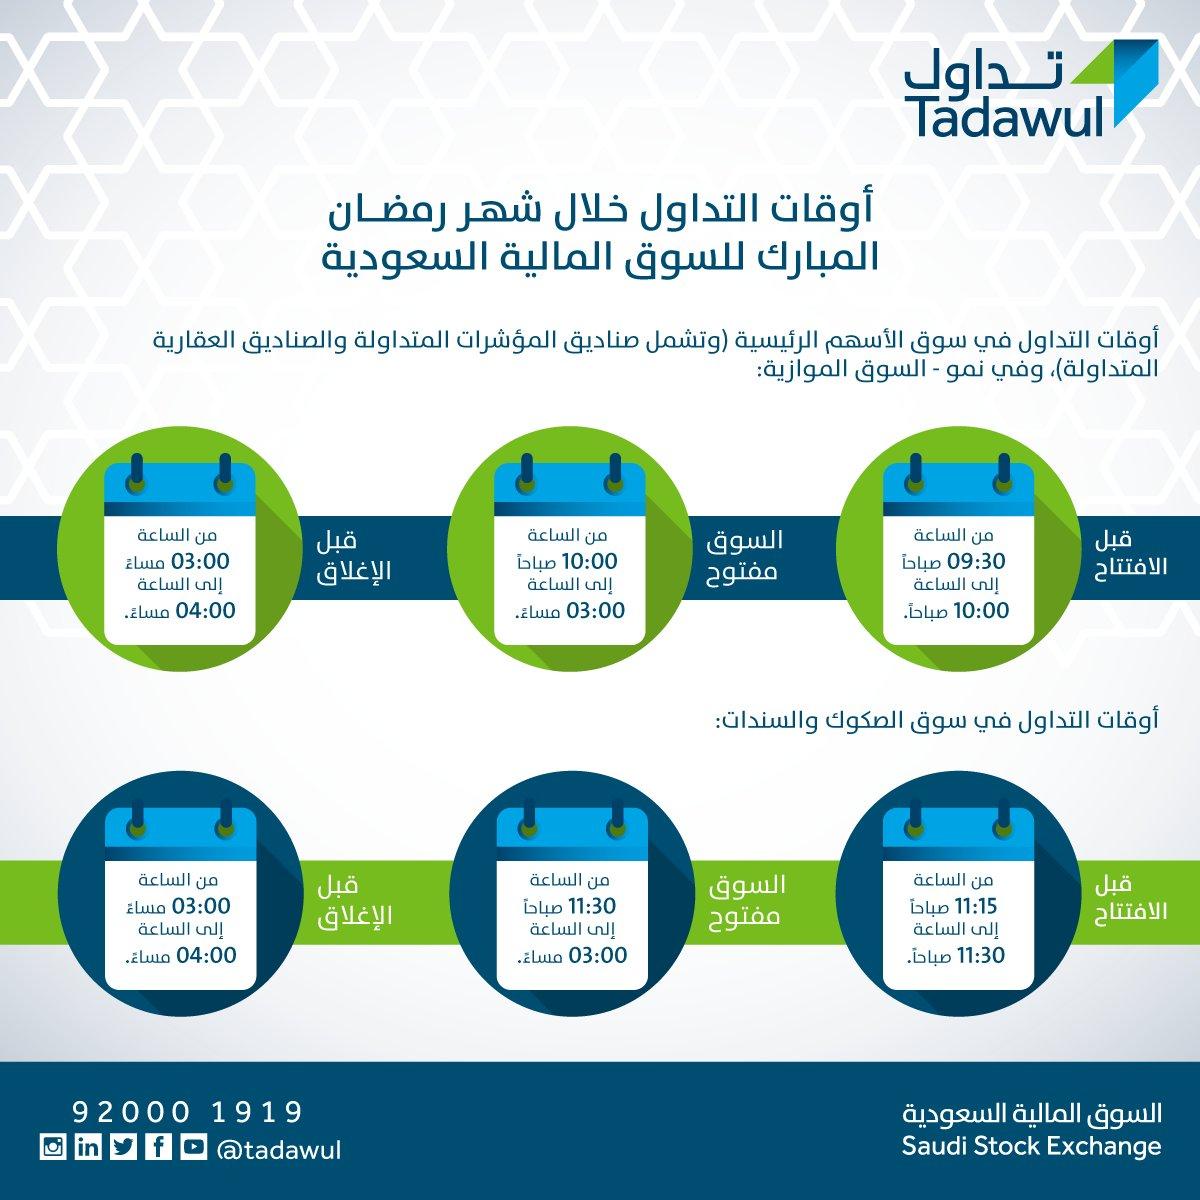 Tadawul تداول Na Twitteru أوقات التداول خـلال شهر رمضان المبارك للسوق المالية السعودية تداول